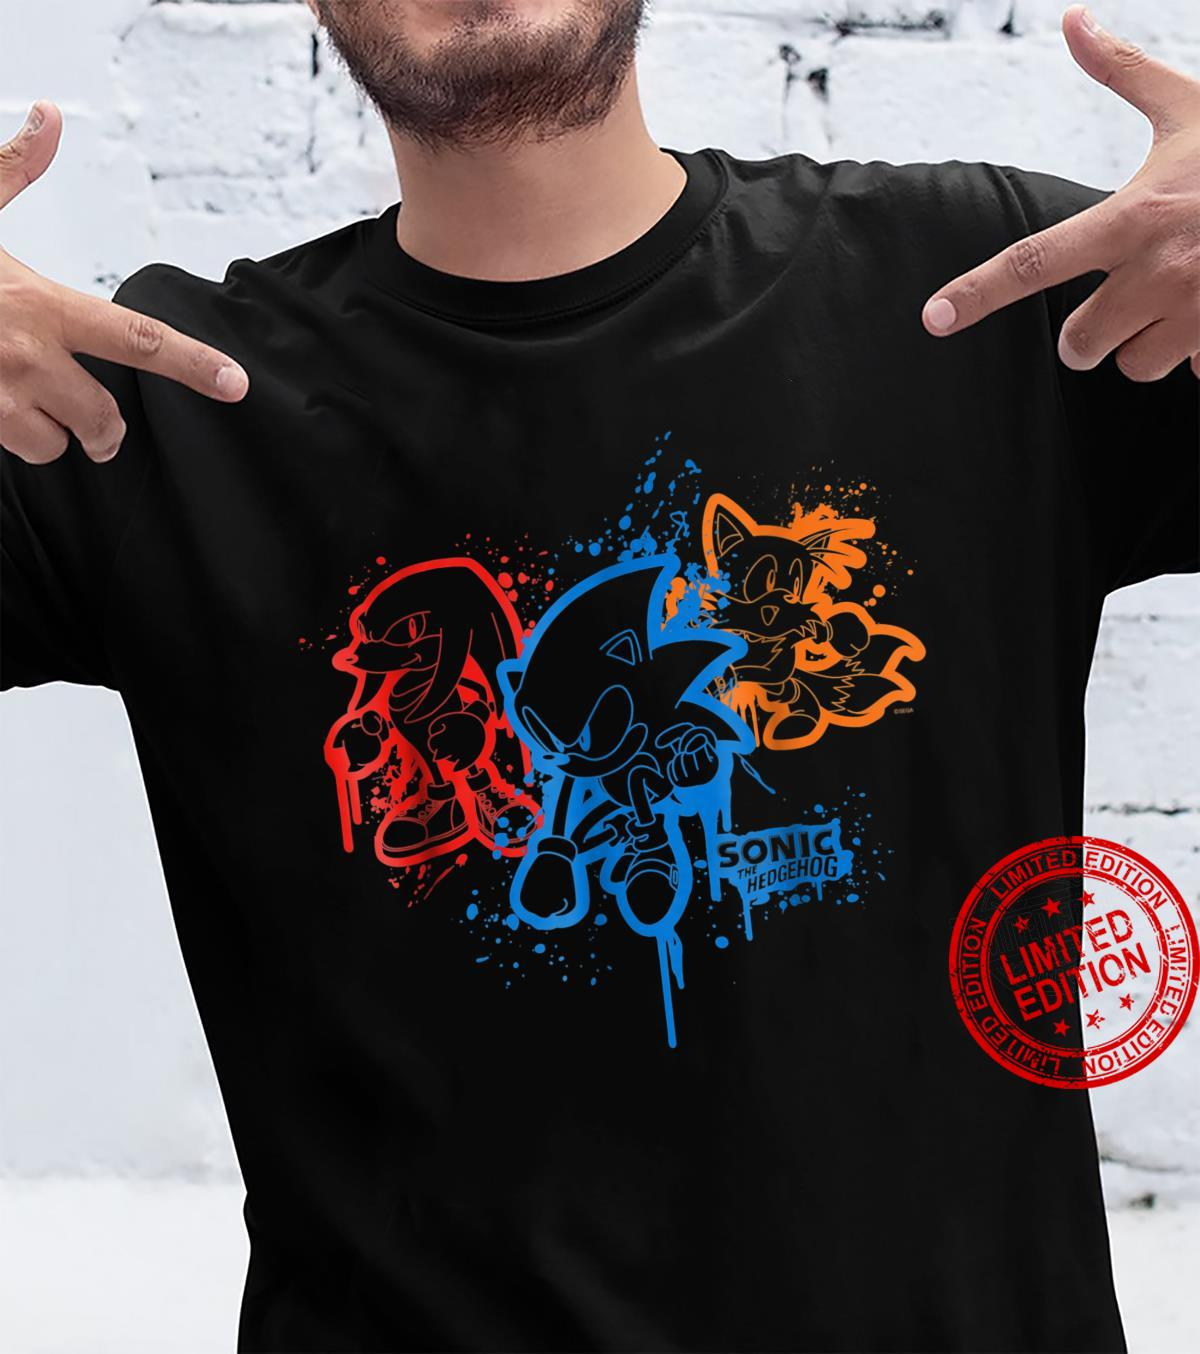 Sonic & Friends Spray Paint Shirt